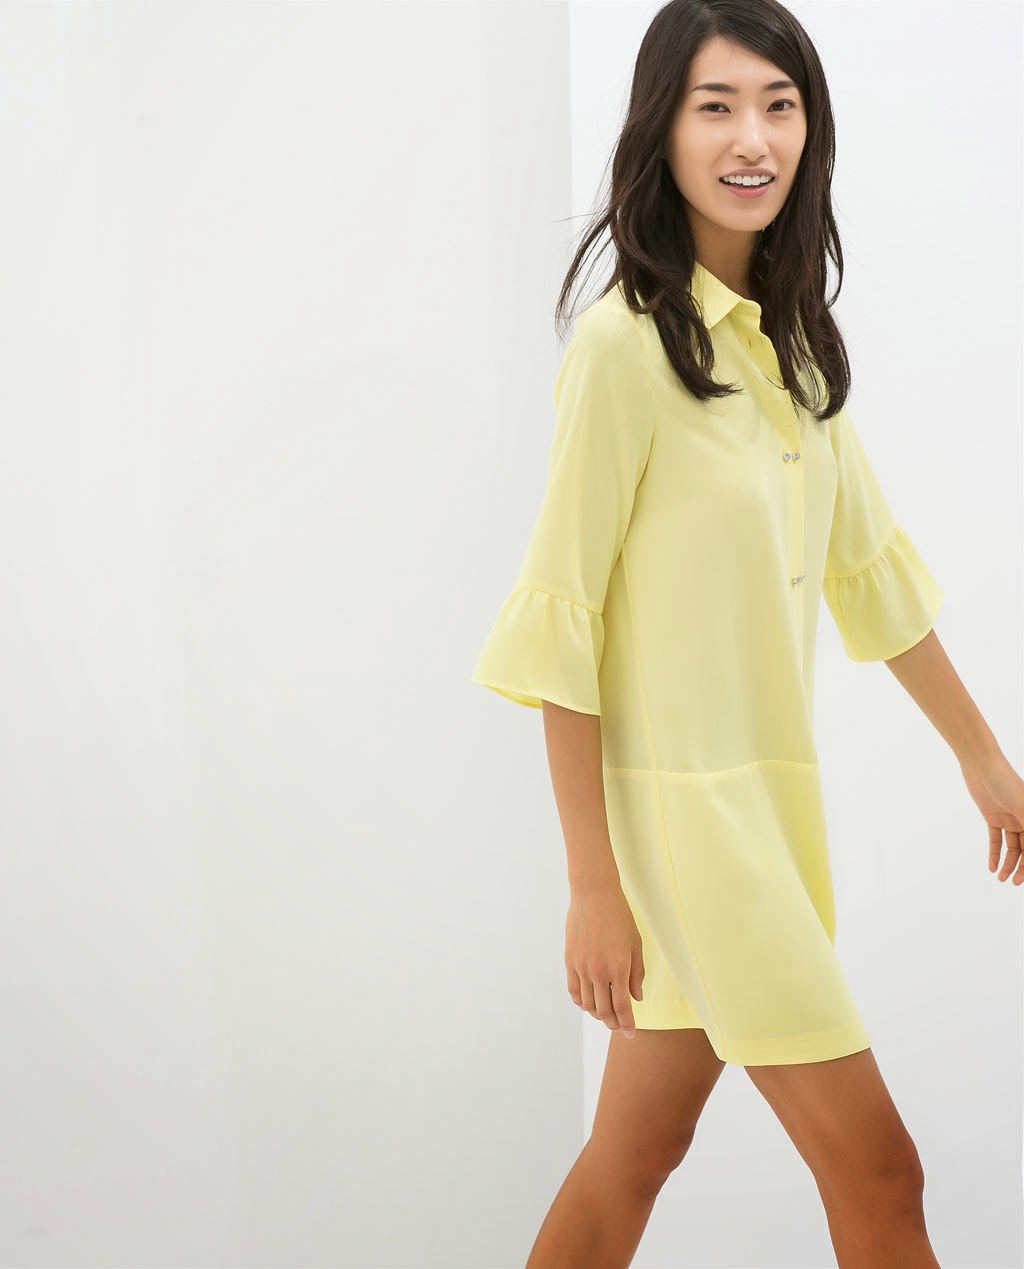 Dress yellow, Zara, street style, fashion style, vestido